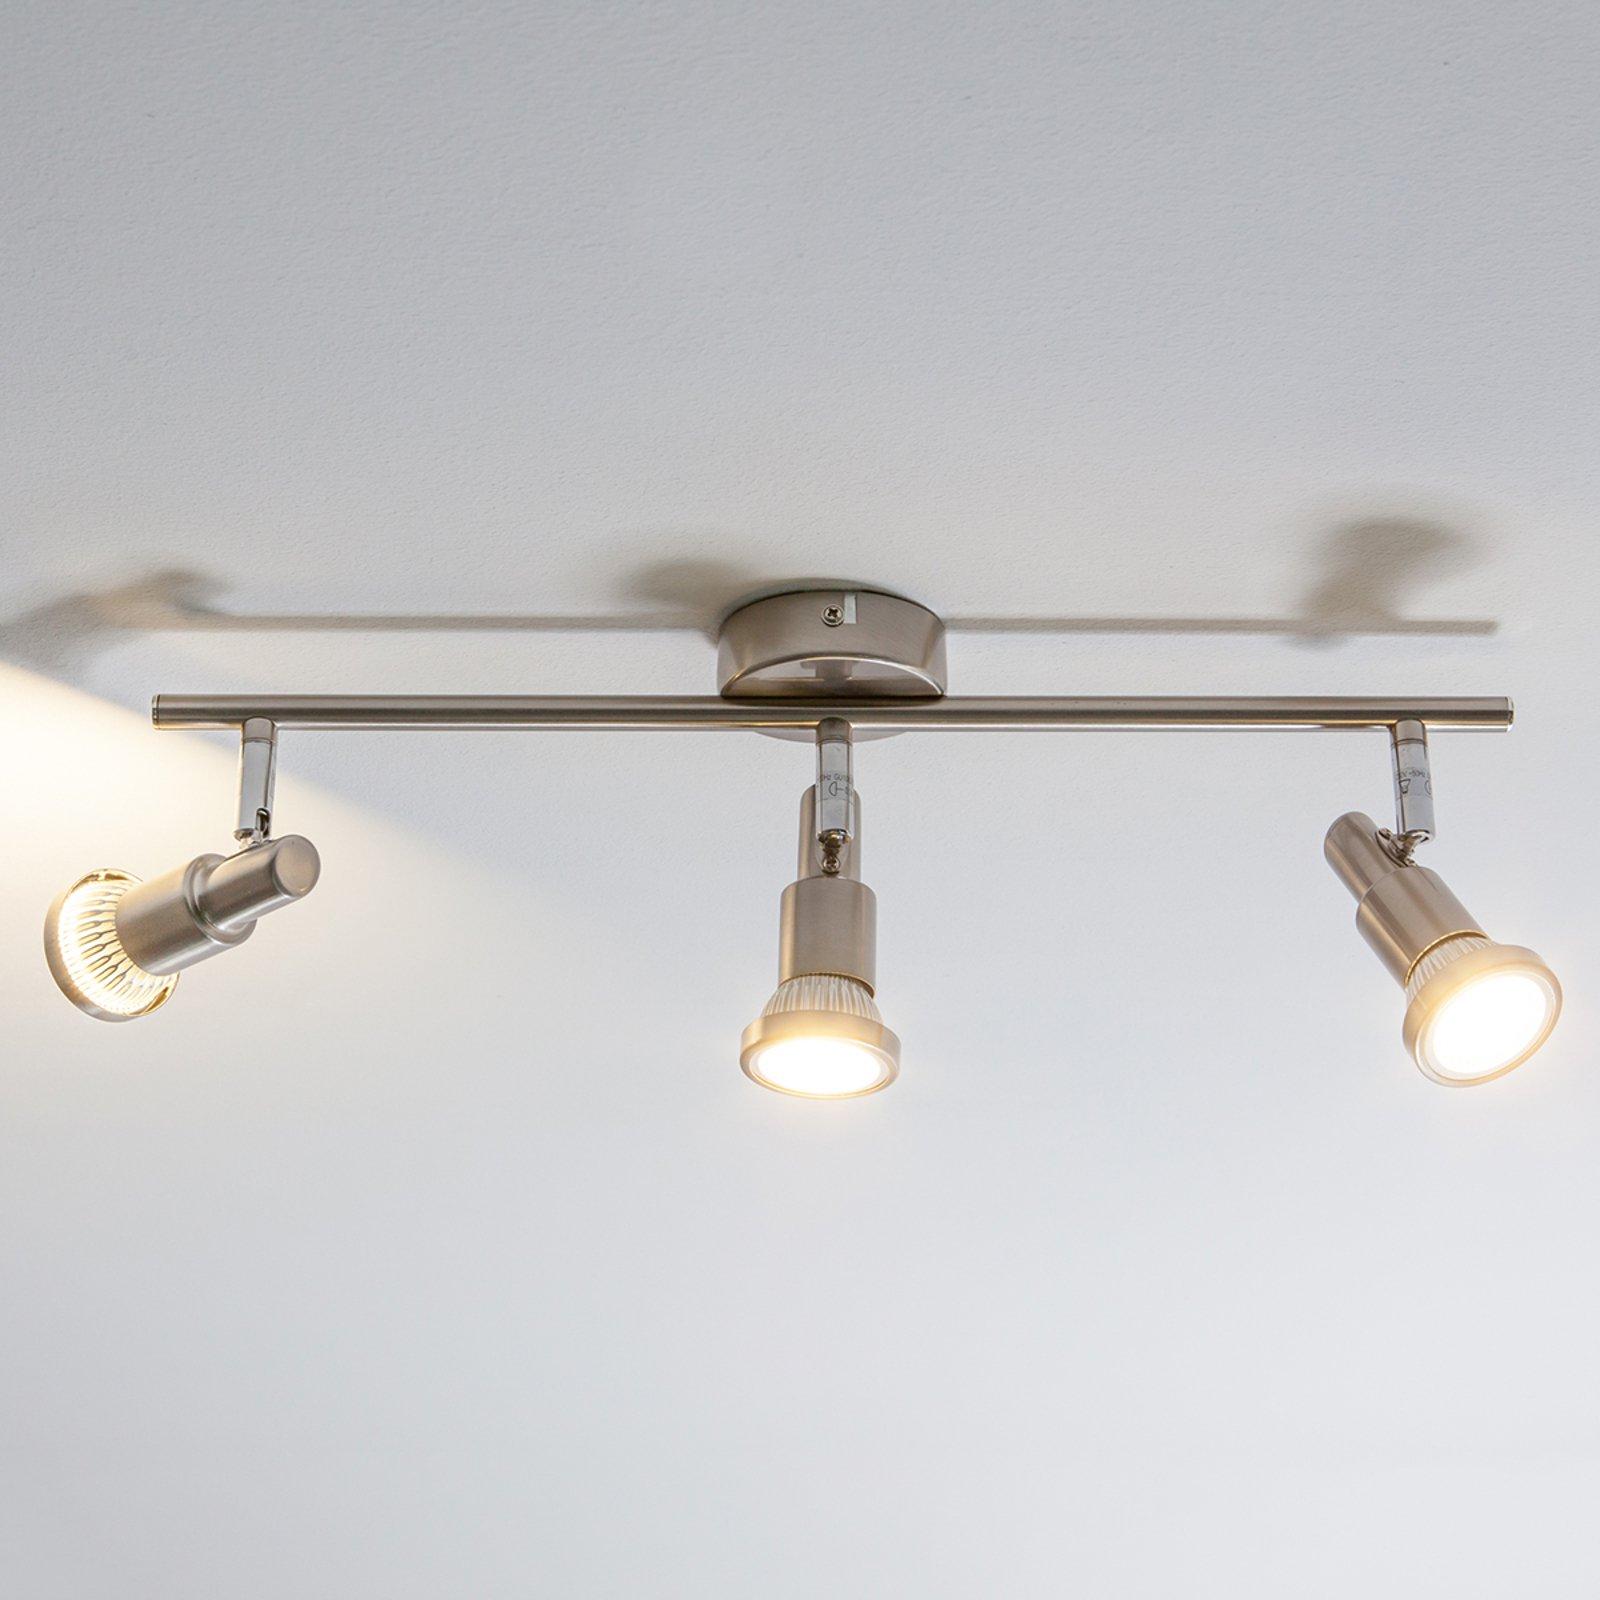 Smal taklampe Aron med 3 lys